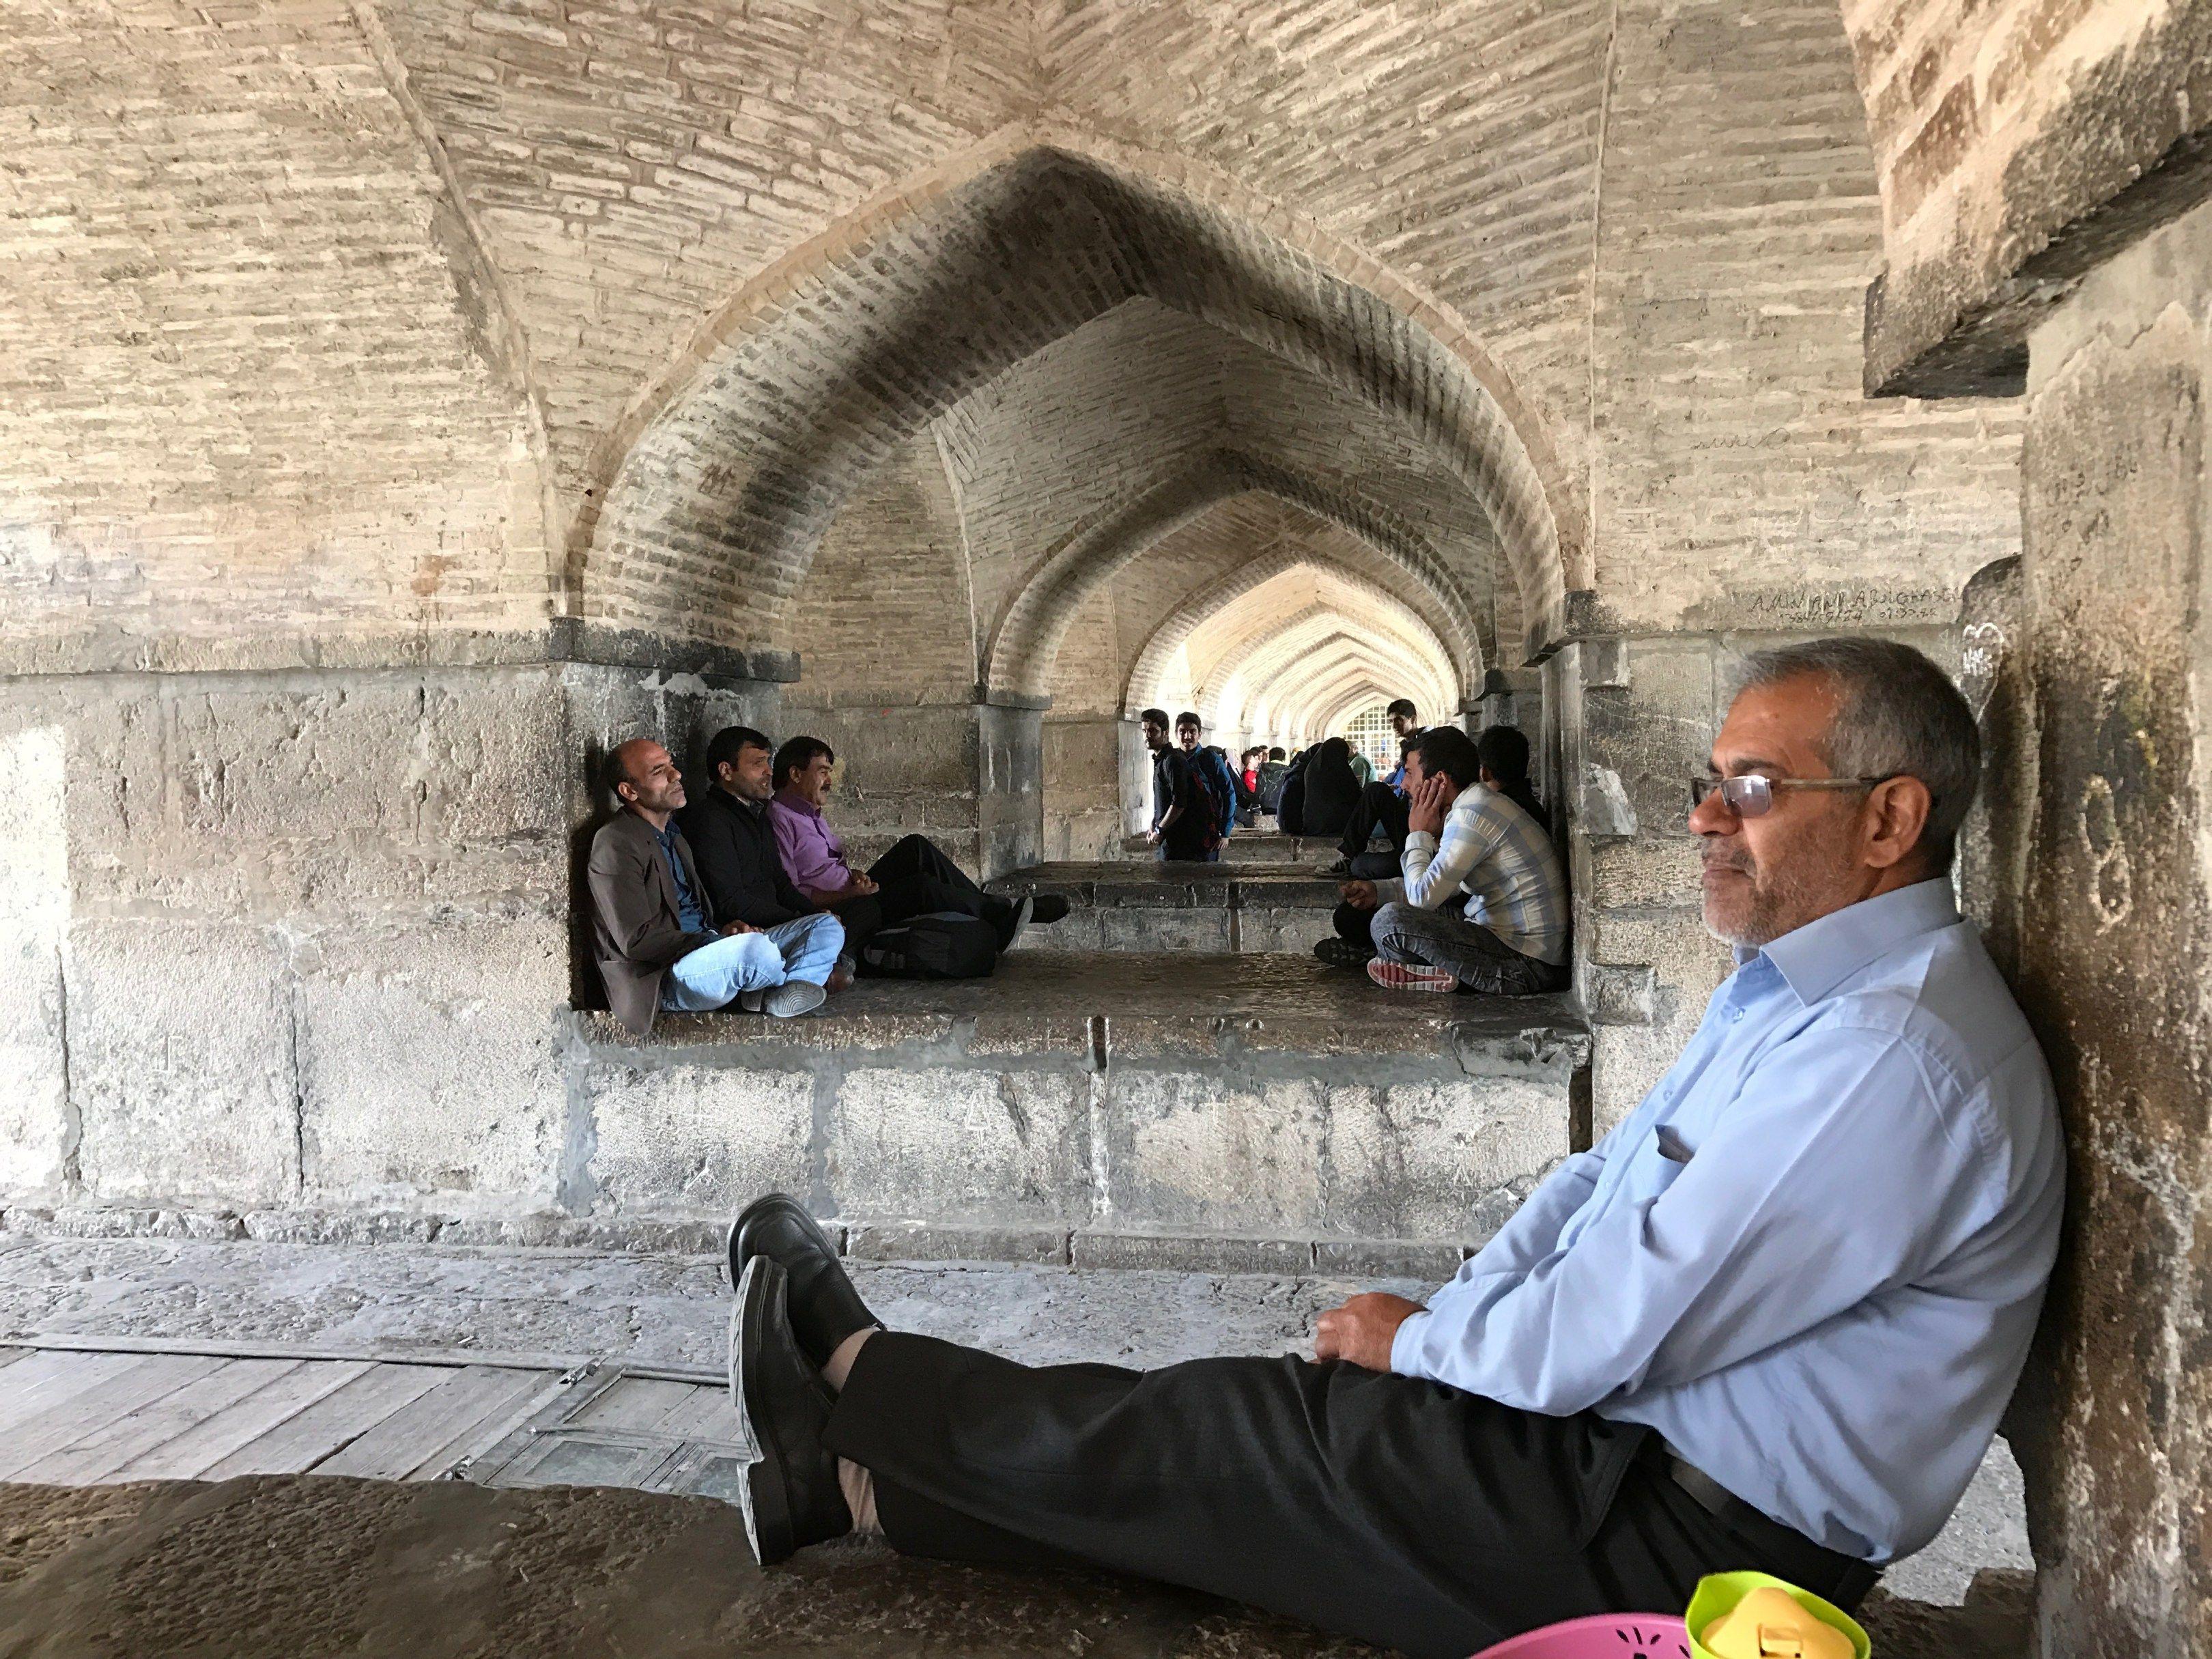 De syngende mænd under Khaju broen http://www.danishadventurer.dk/se-esfahans-flotte-broer-langs-floden/